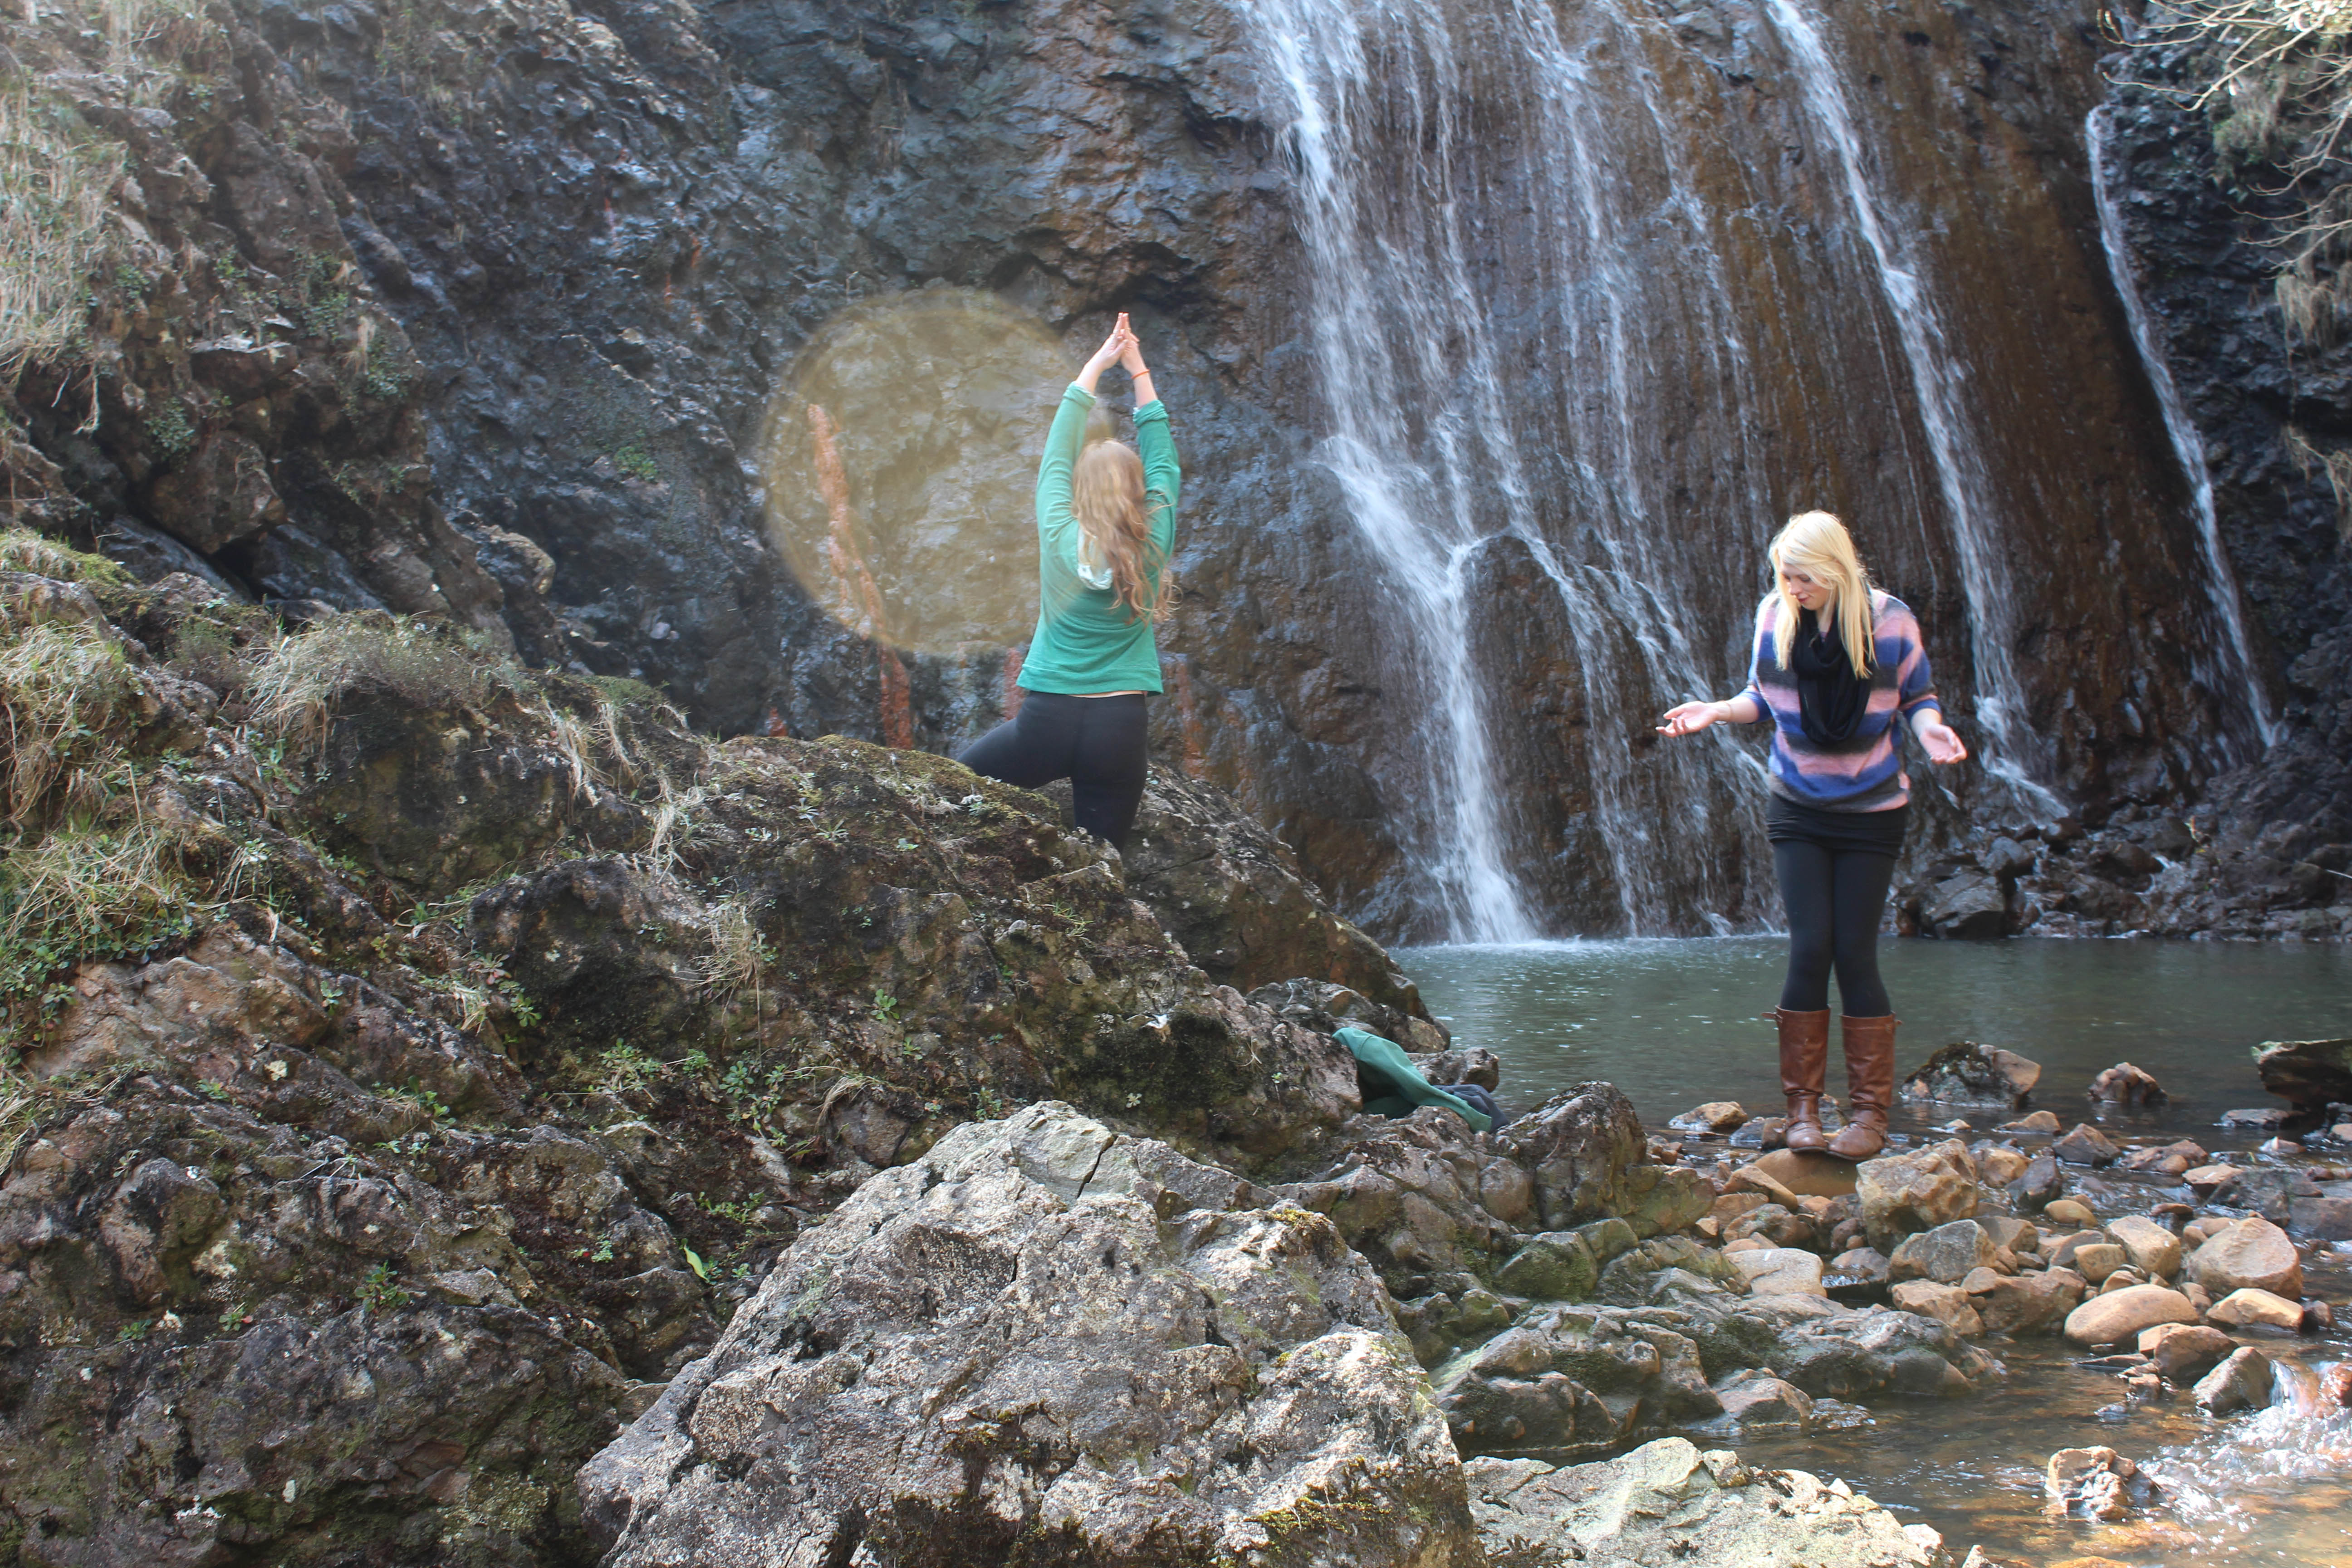 Douchebag waterfall shot